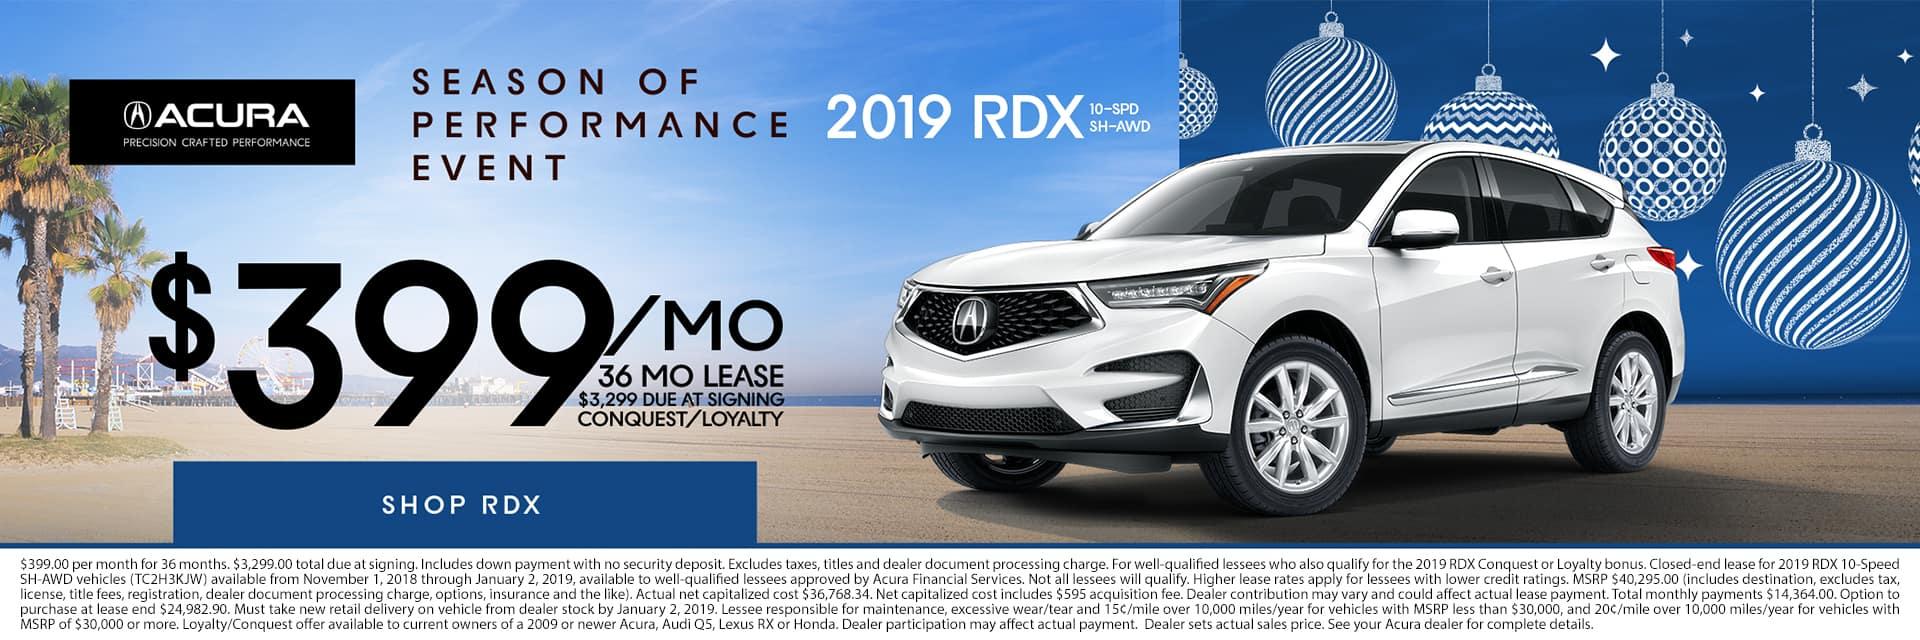 2019 RDX AWD Season of Performance